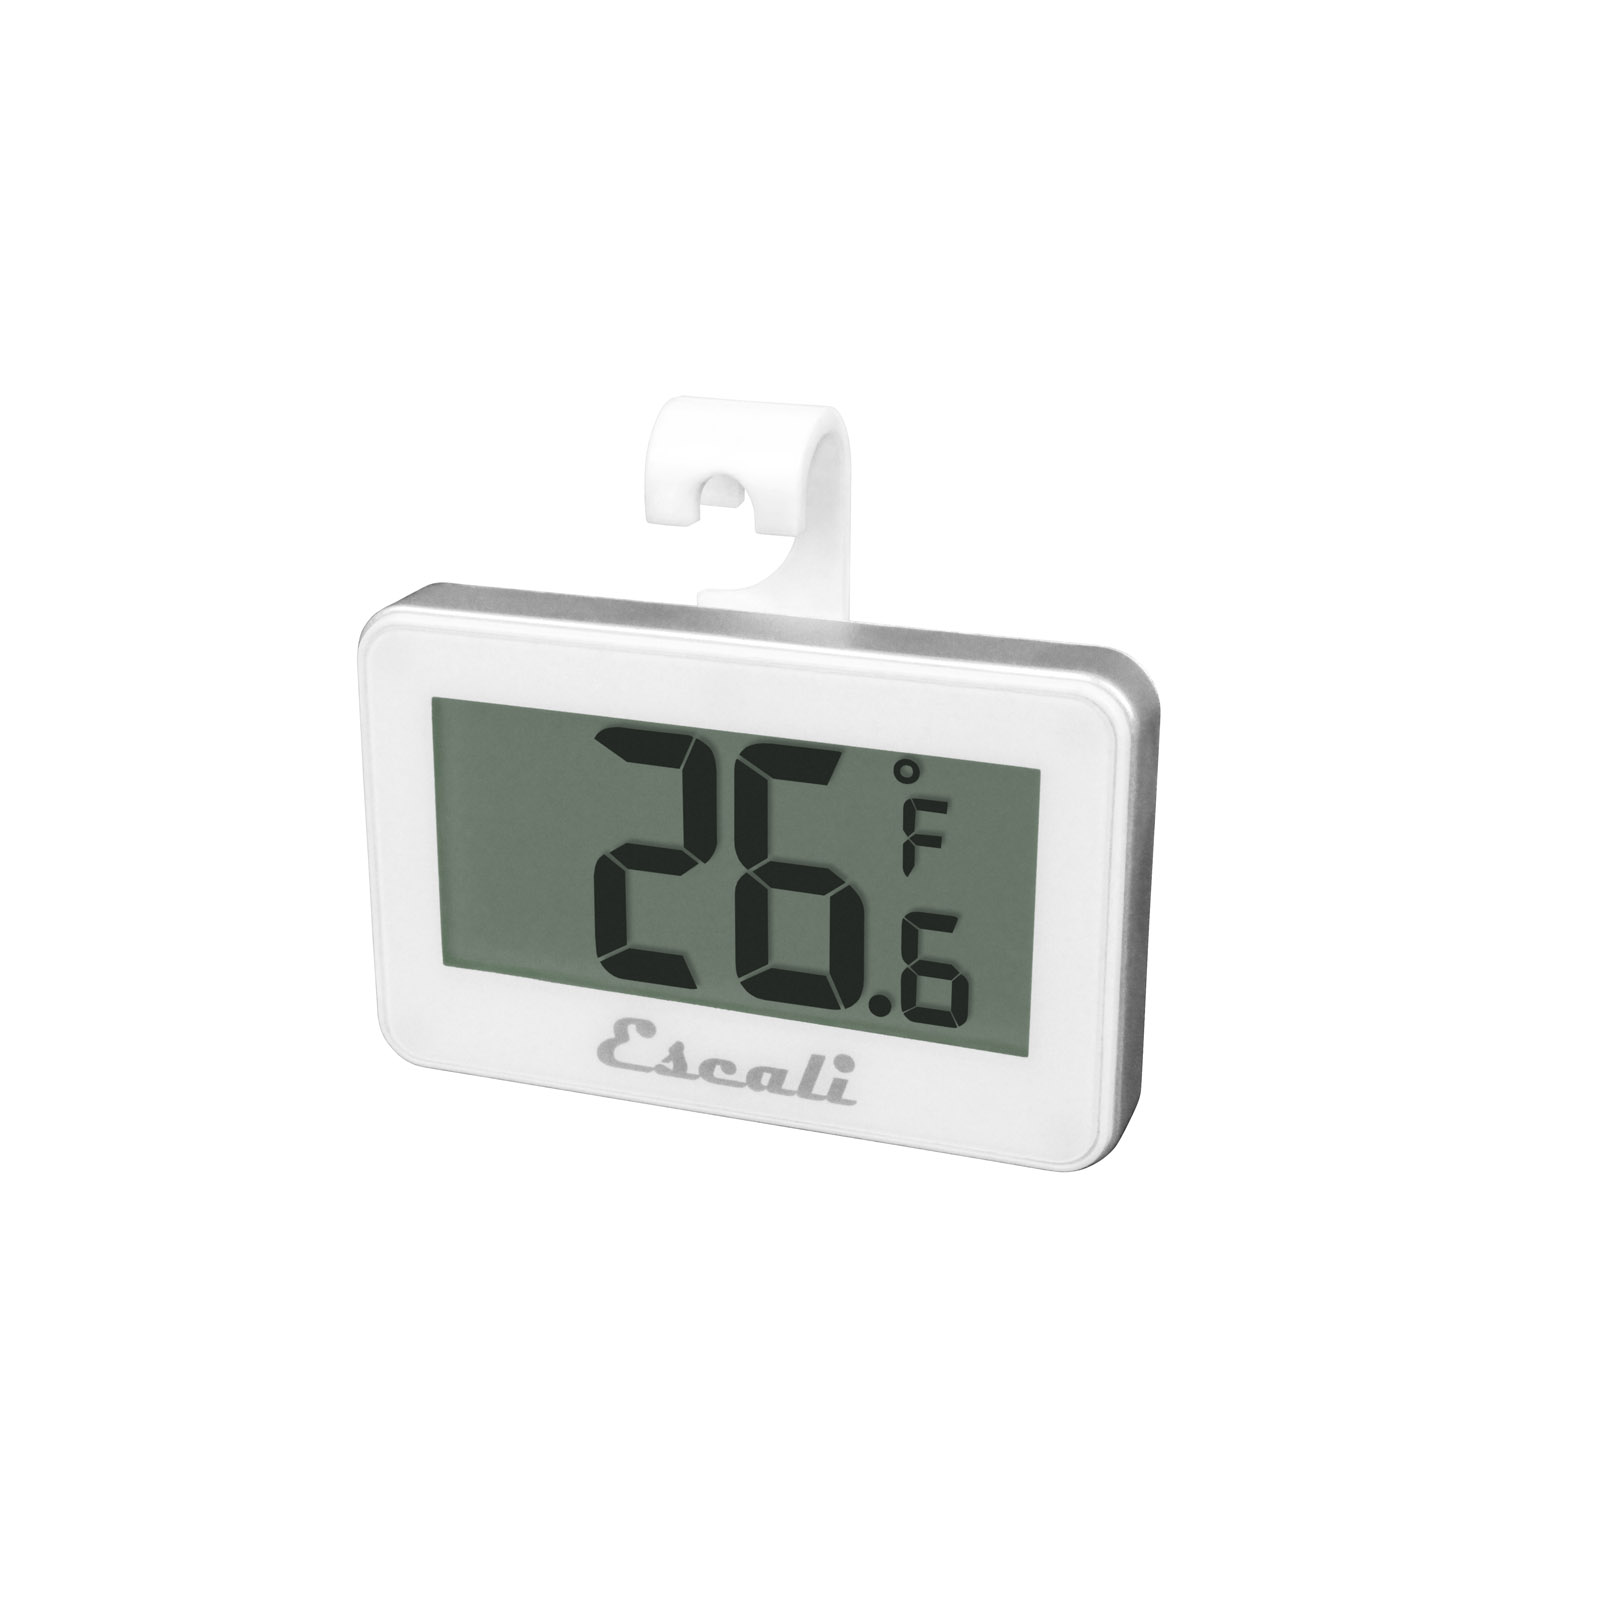 2650-87 San Jamar THDGRF thermometer, refrig freezer